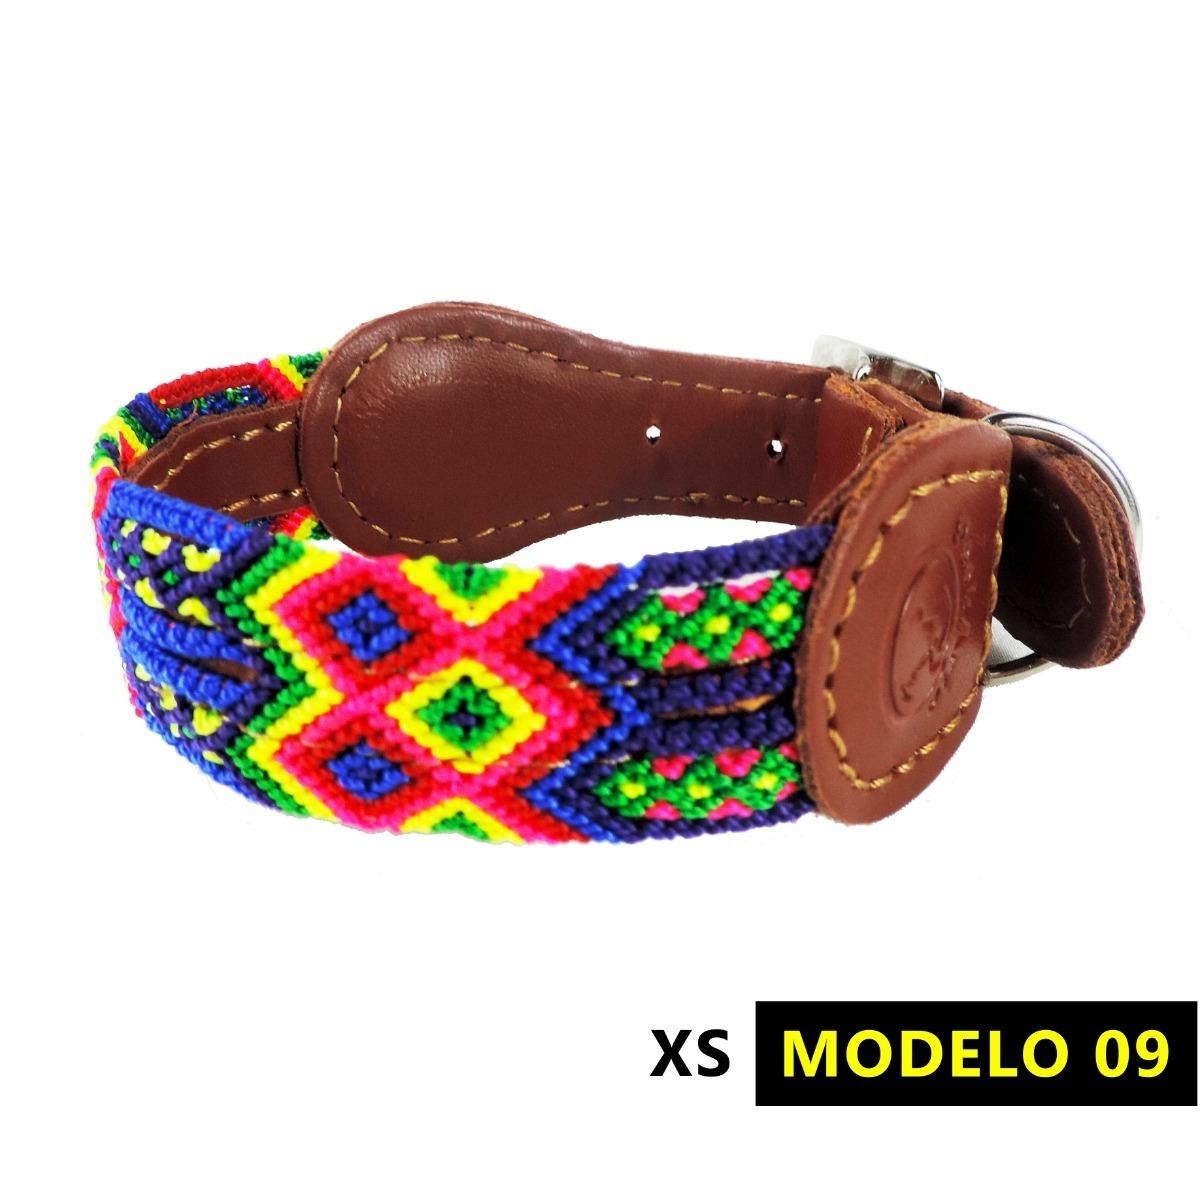 702b5359b3c2 Collar Tejido Artesanal Para Mascotas Talla Chica -   220.00 en ...